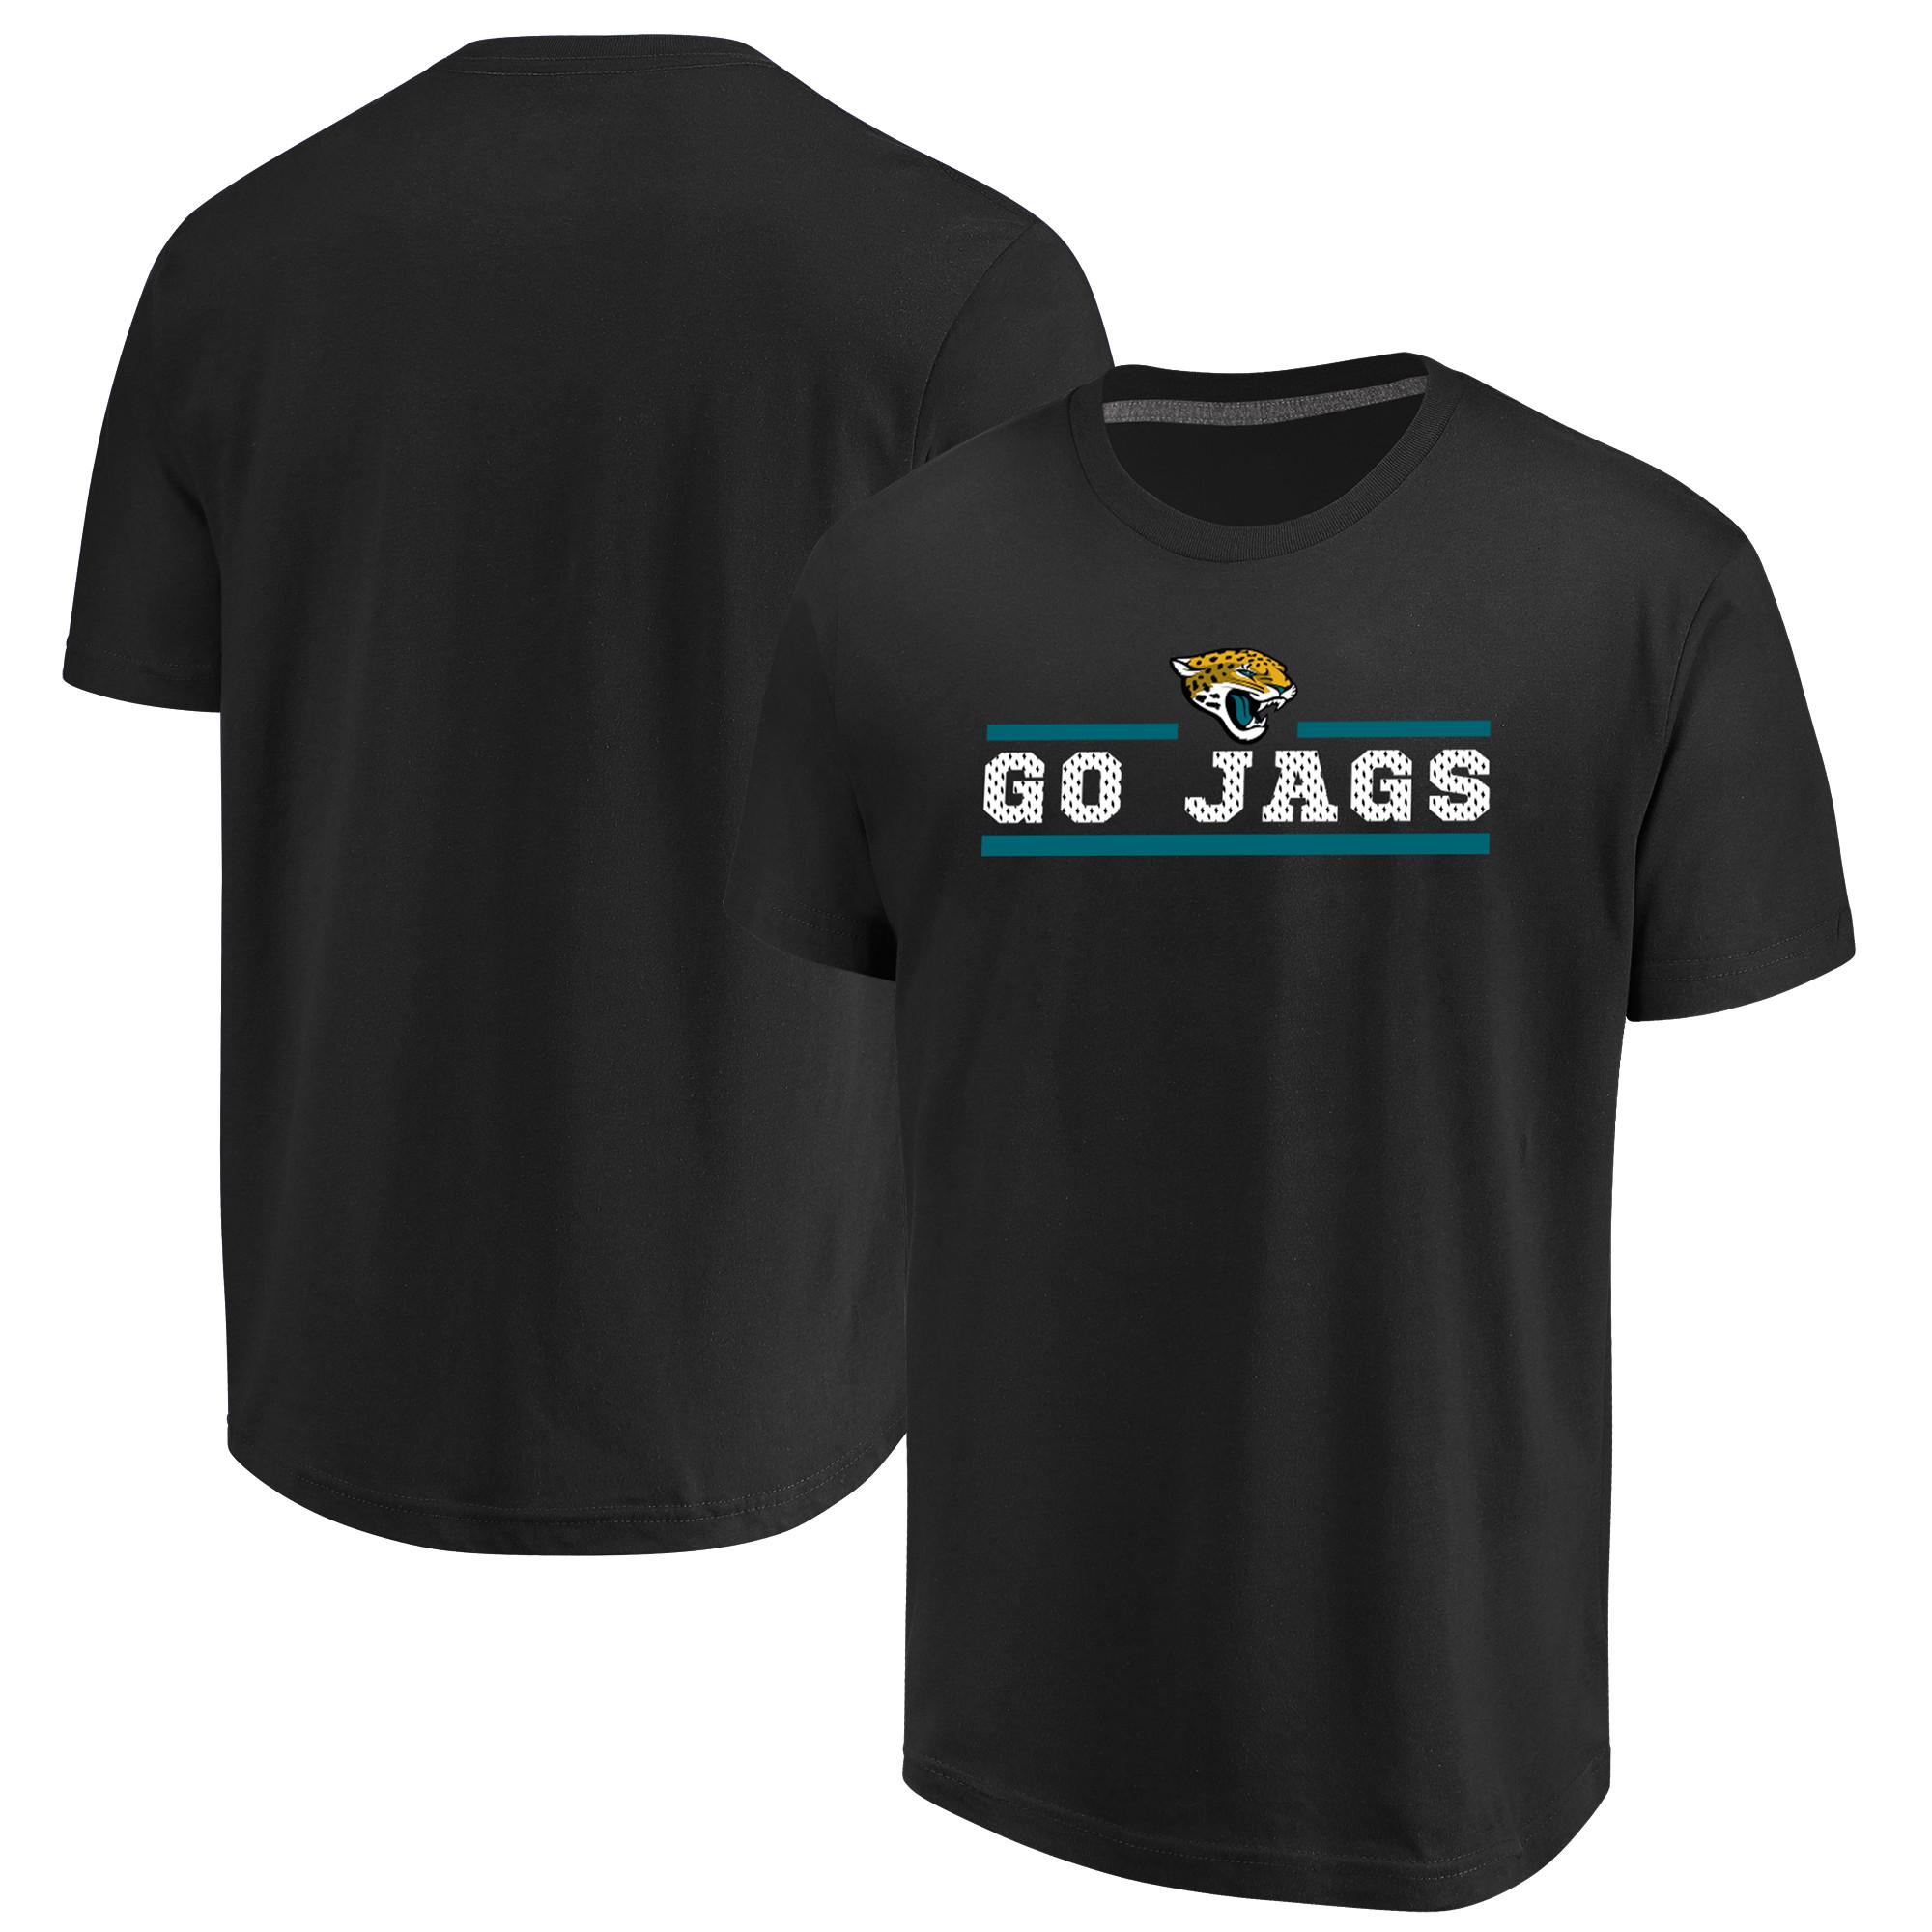 Jacksonville Jaguars Majestic Safety Blitz T-Shirt - Black